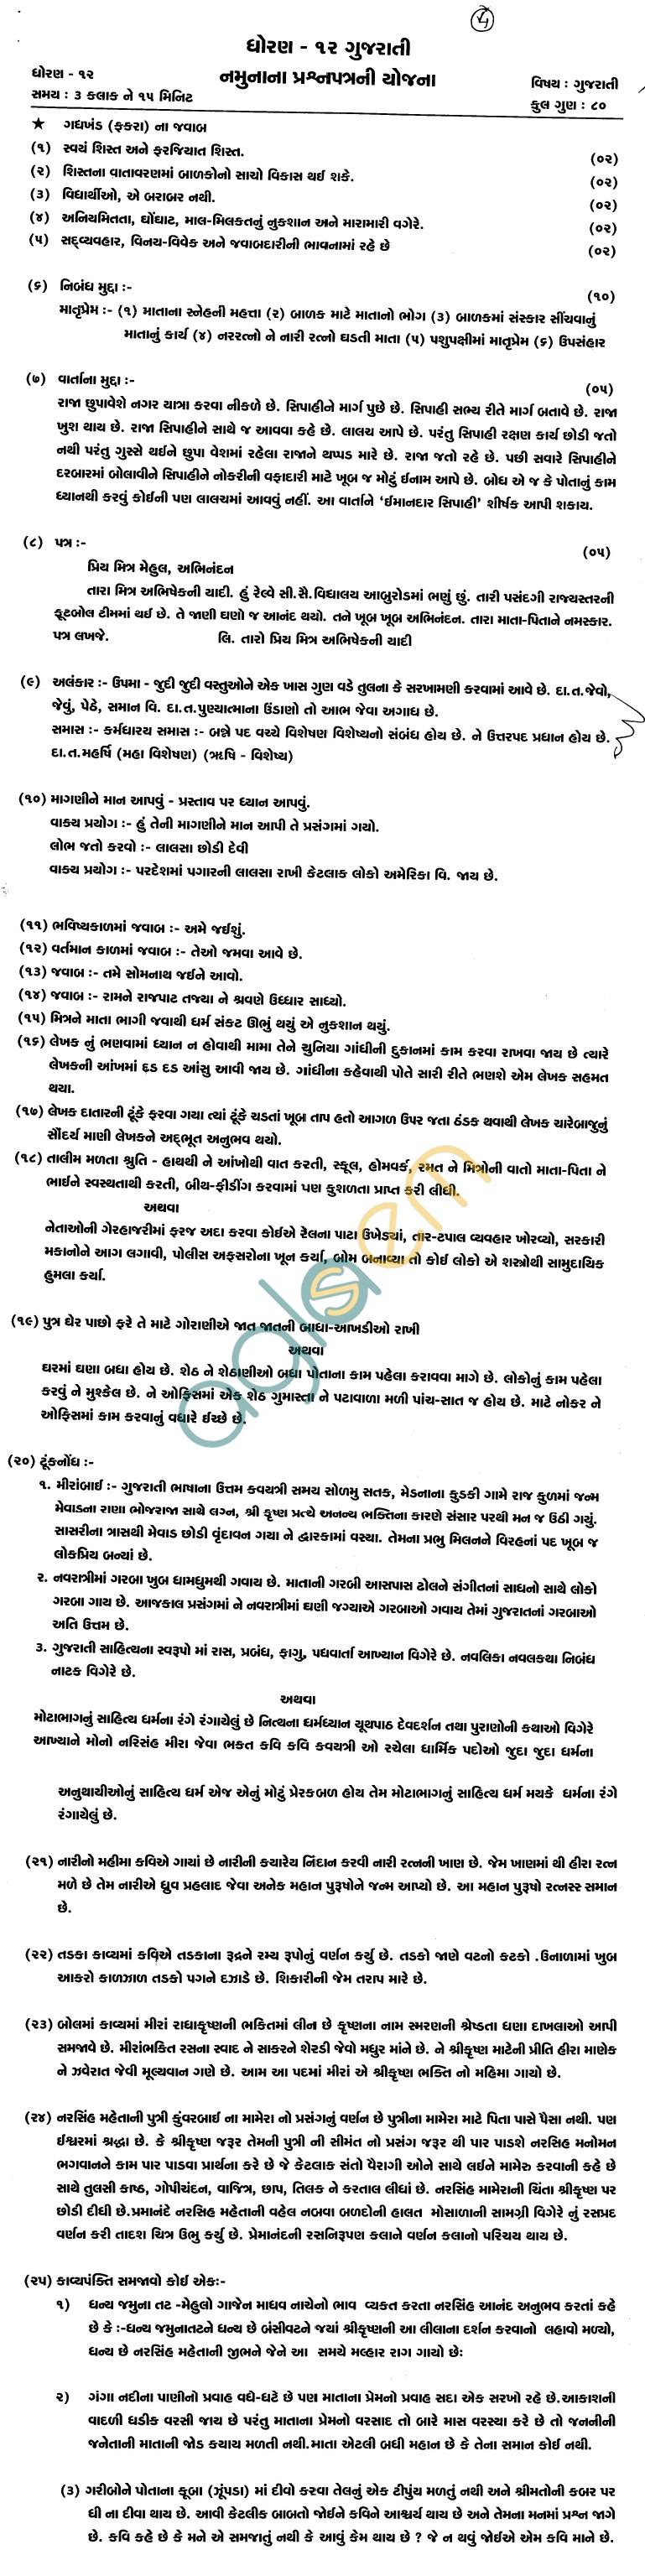 Rajasthan Board Class 12 Gujrati Model Question Paper